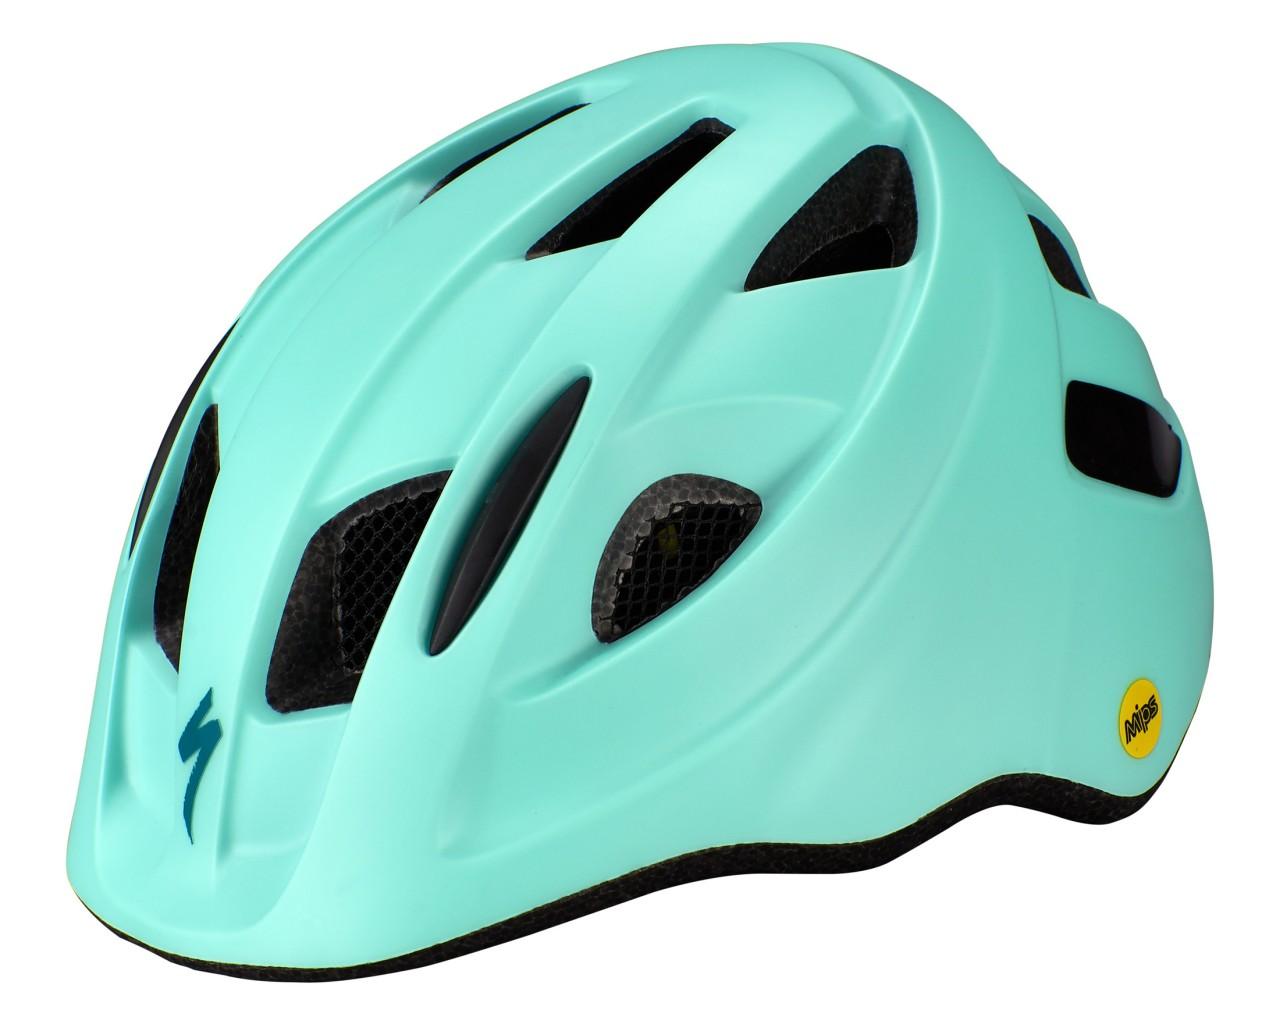 Specialized Mio MIPS Kinder Fahrrad Helm | mint